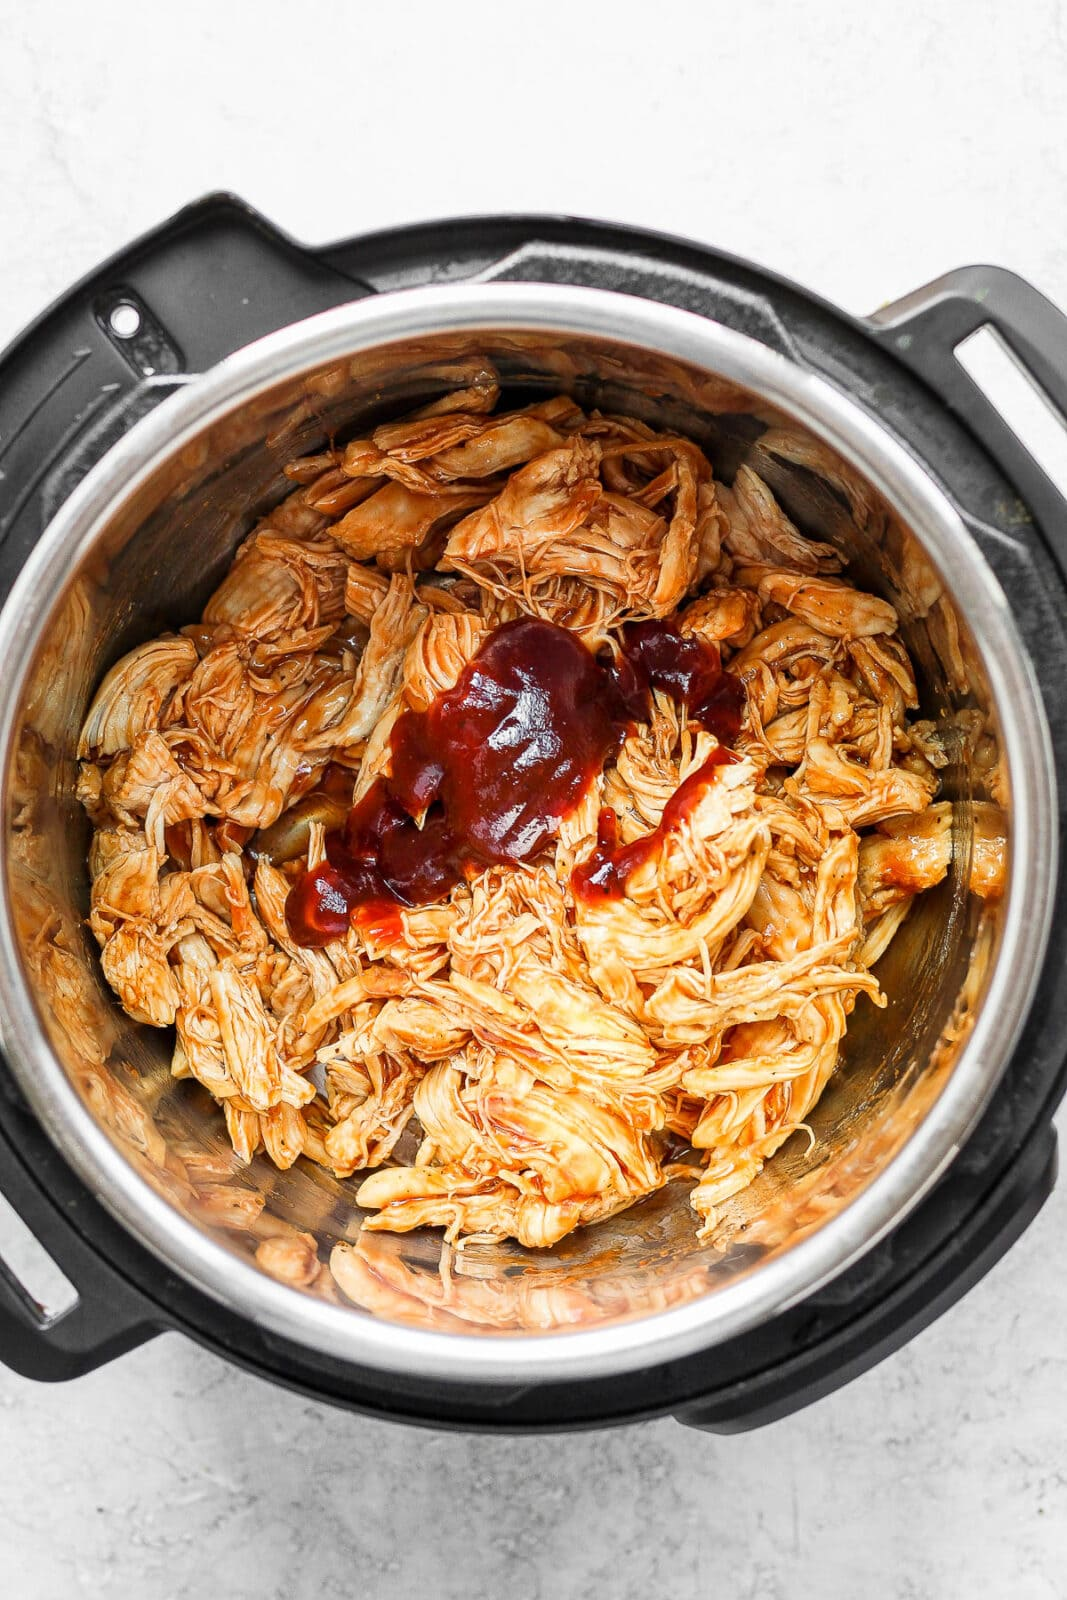 Shredded BBQ chicken in an Instant Pot.